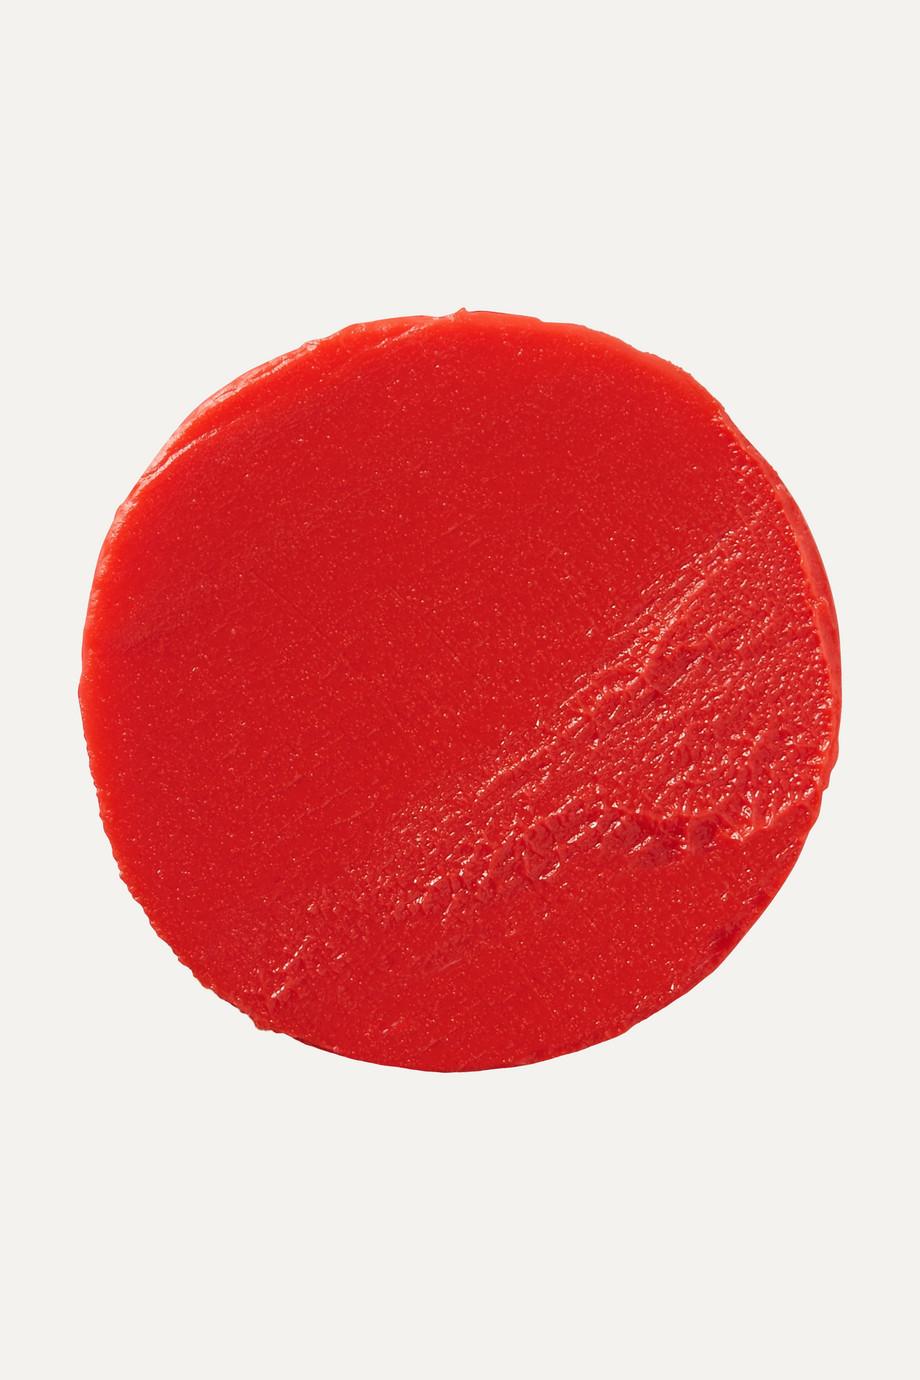 Lipstick Queen Saint Lipstick – Coral Red – Lippentstift